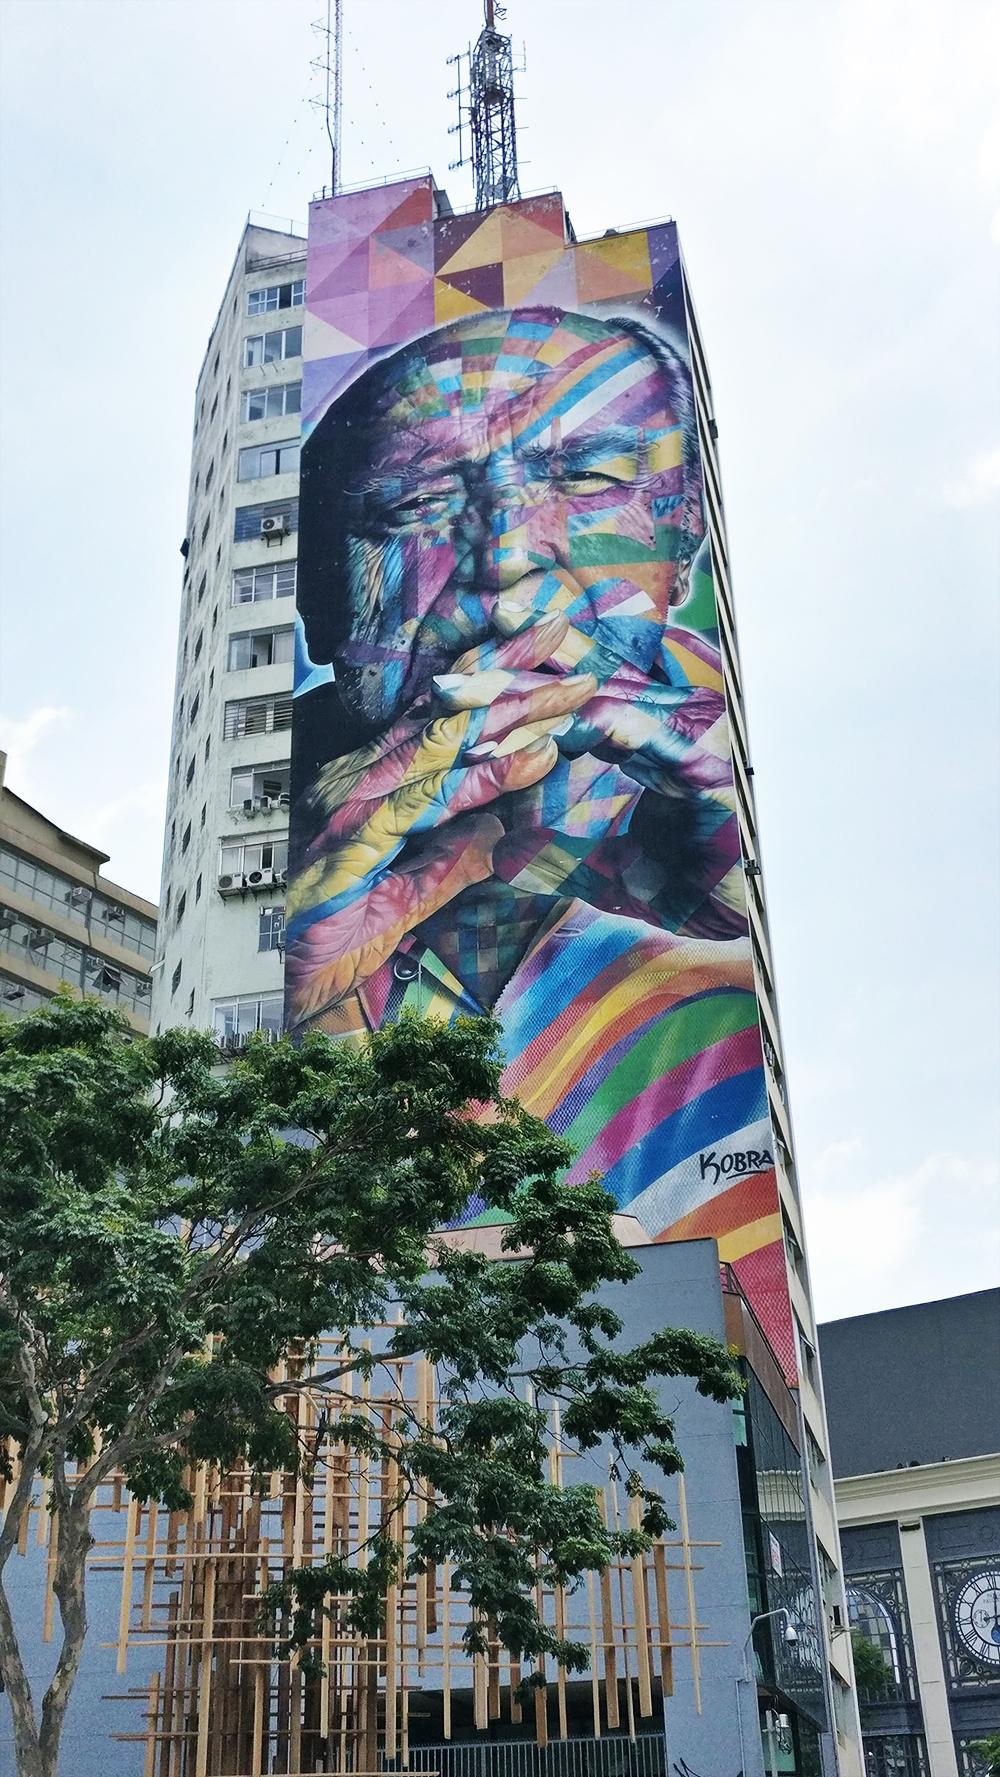 Street art: Oscar Niemeyer mural by Eduardo Kobra on Avenida Paulista, São Paulo - 10 things to do and see in São Paulo | Aliz's Wonderland